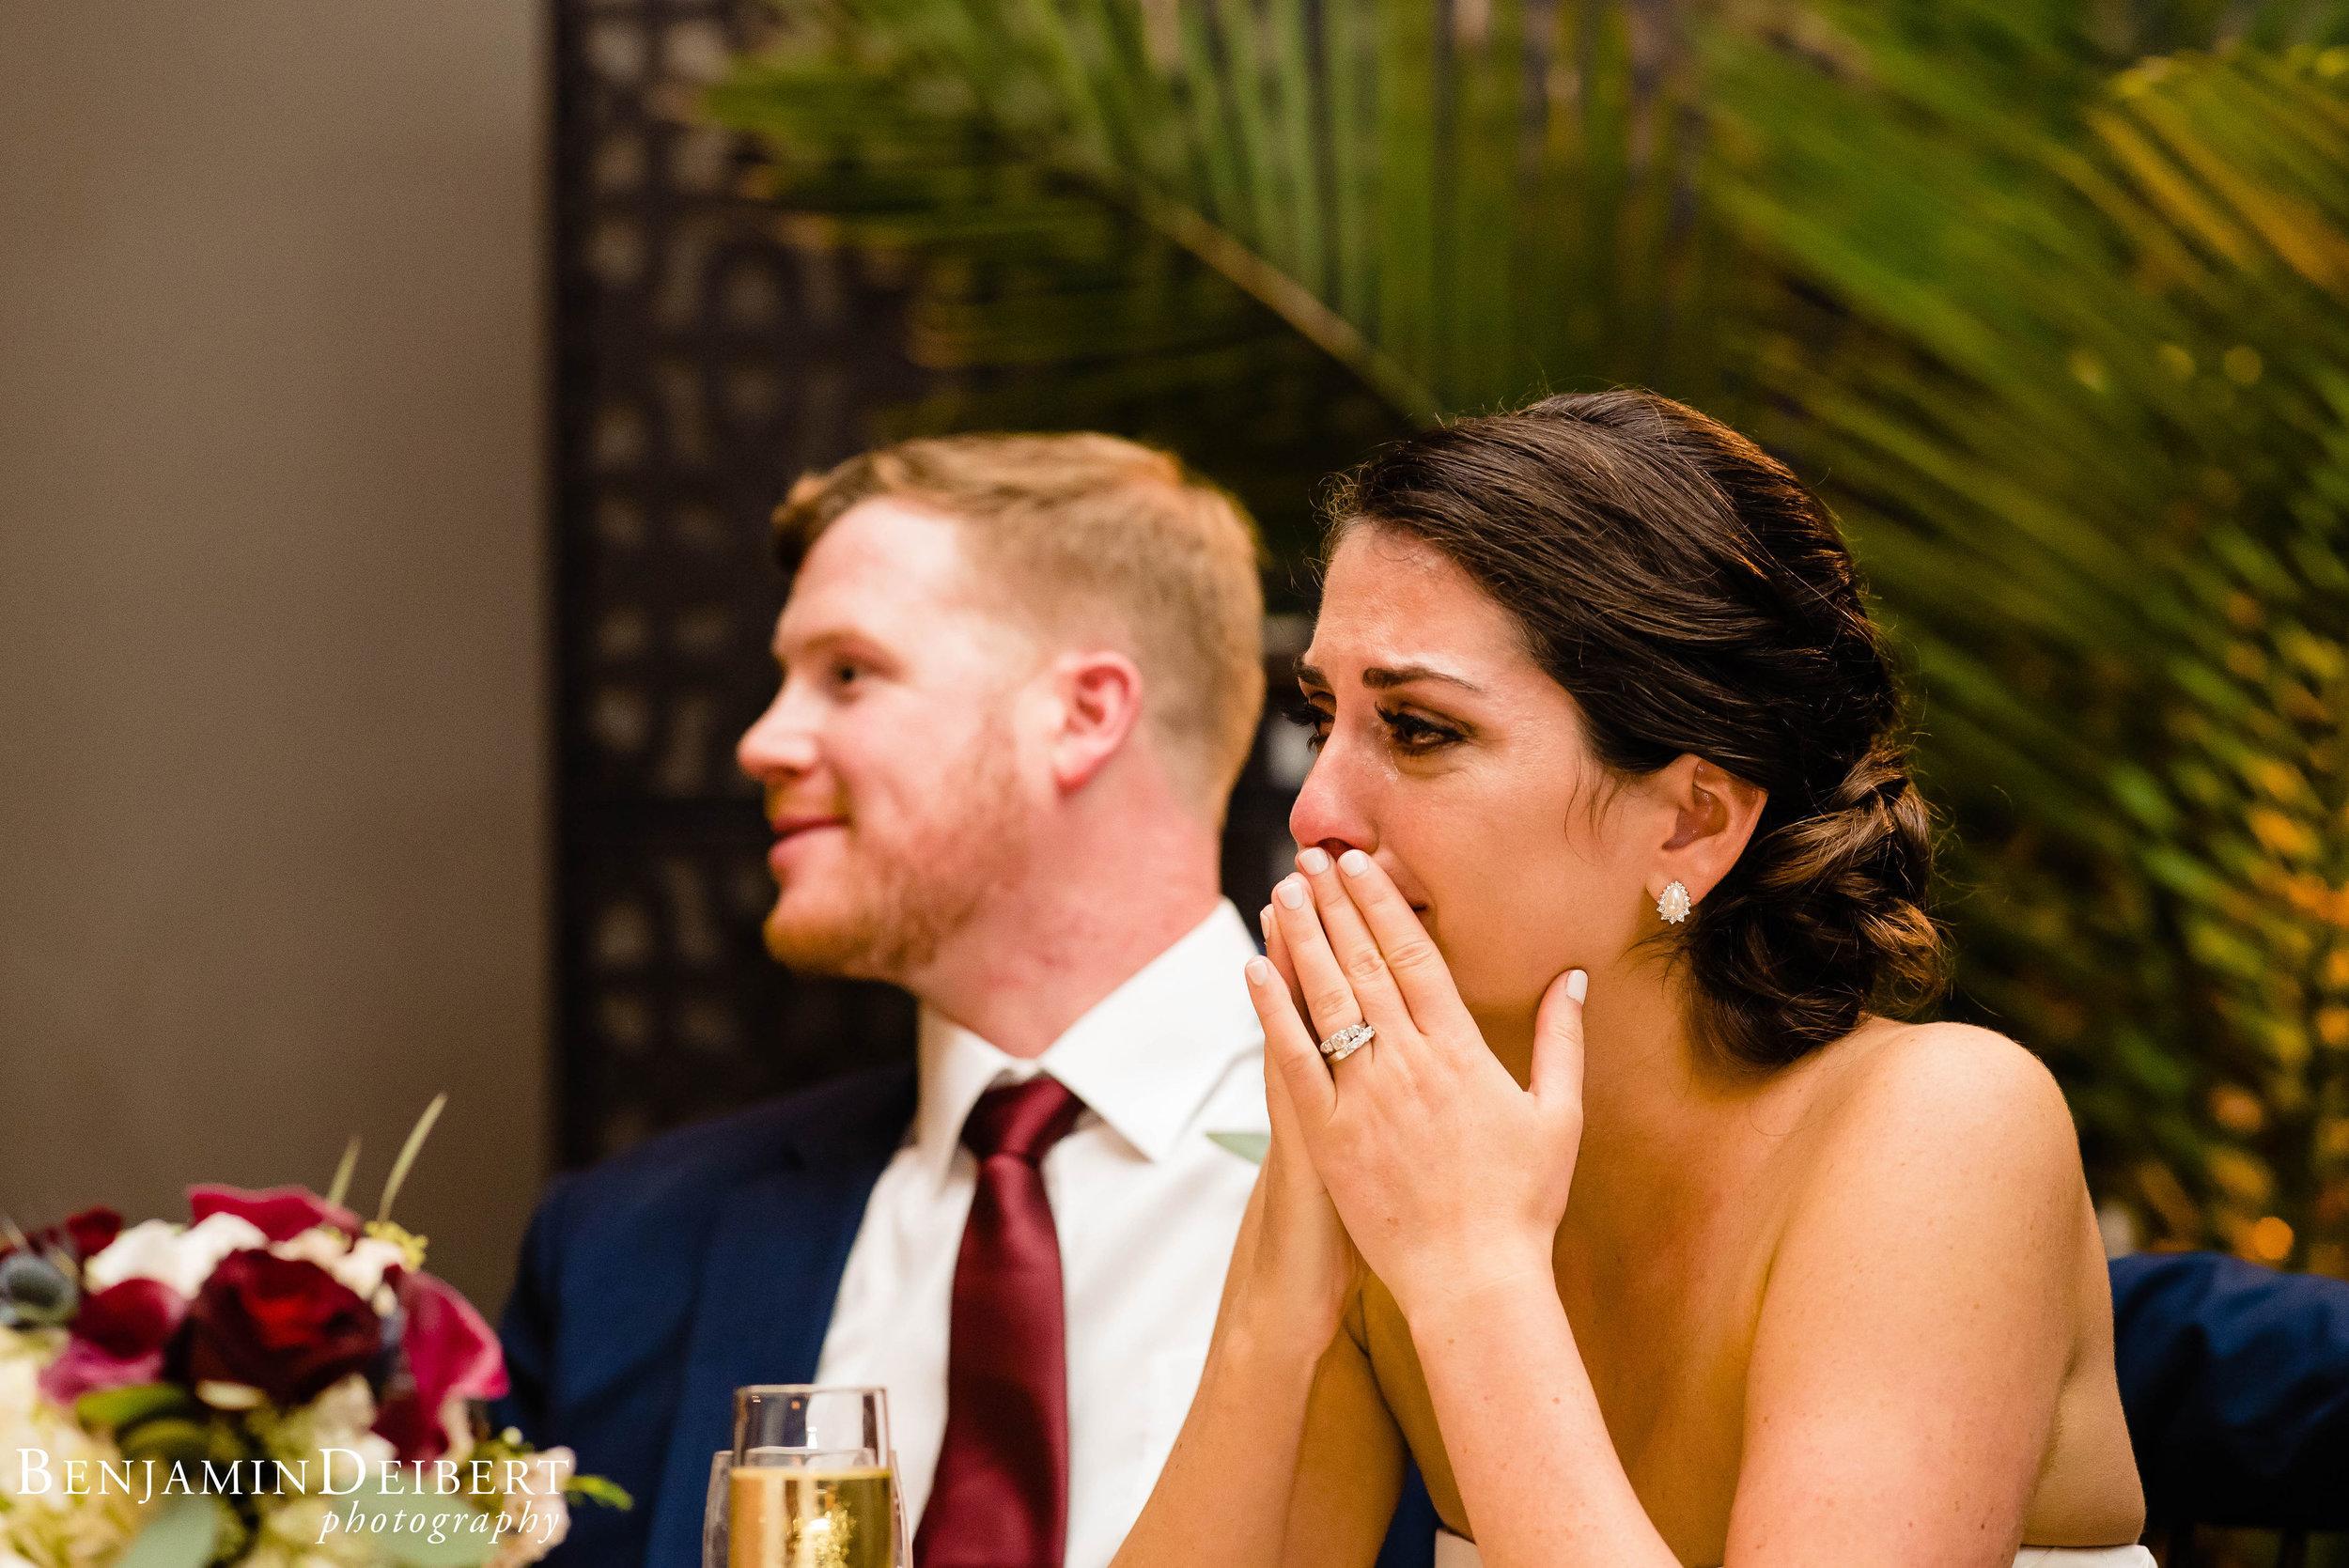 TeghanandChris_BridgemensBallroom_Wedding-107.jpg